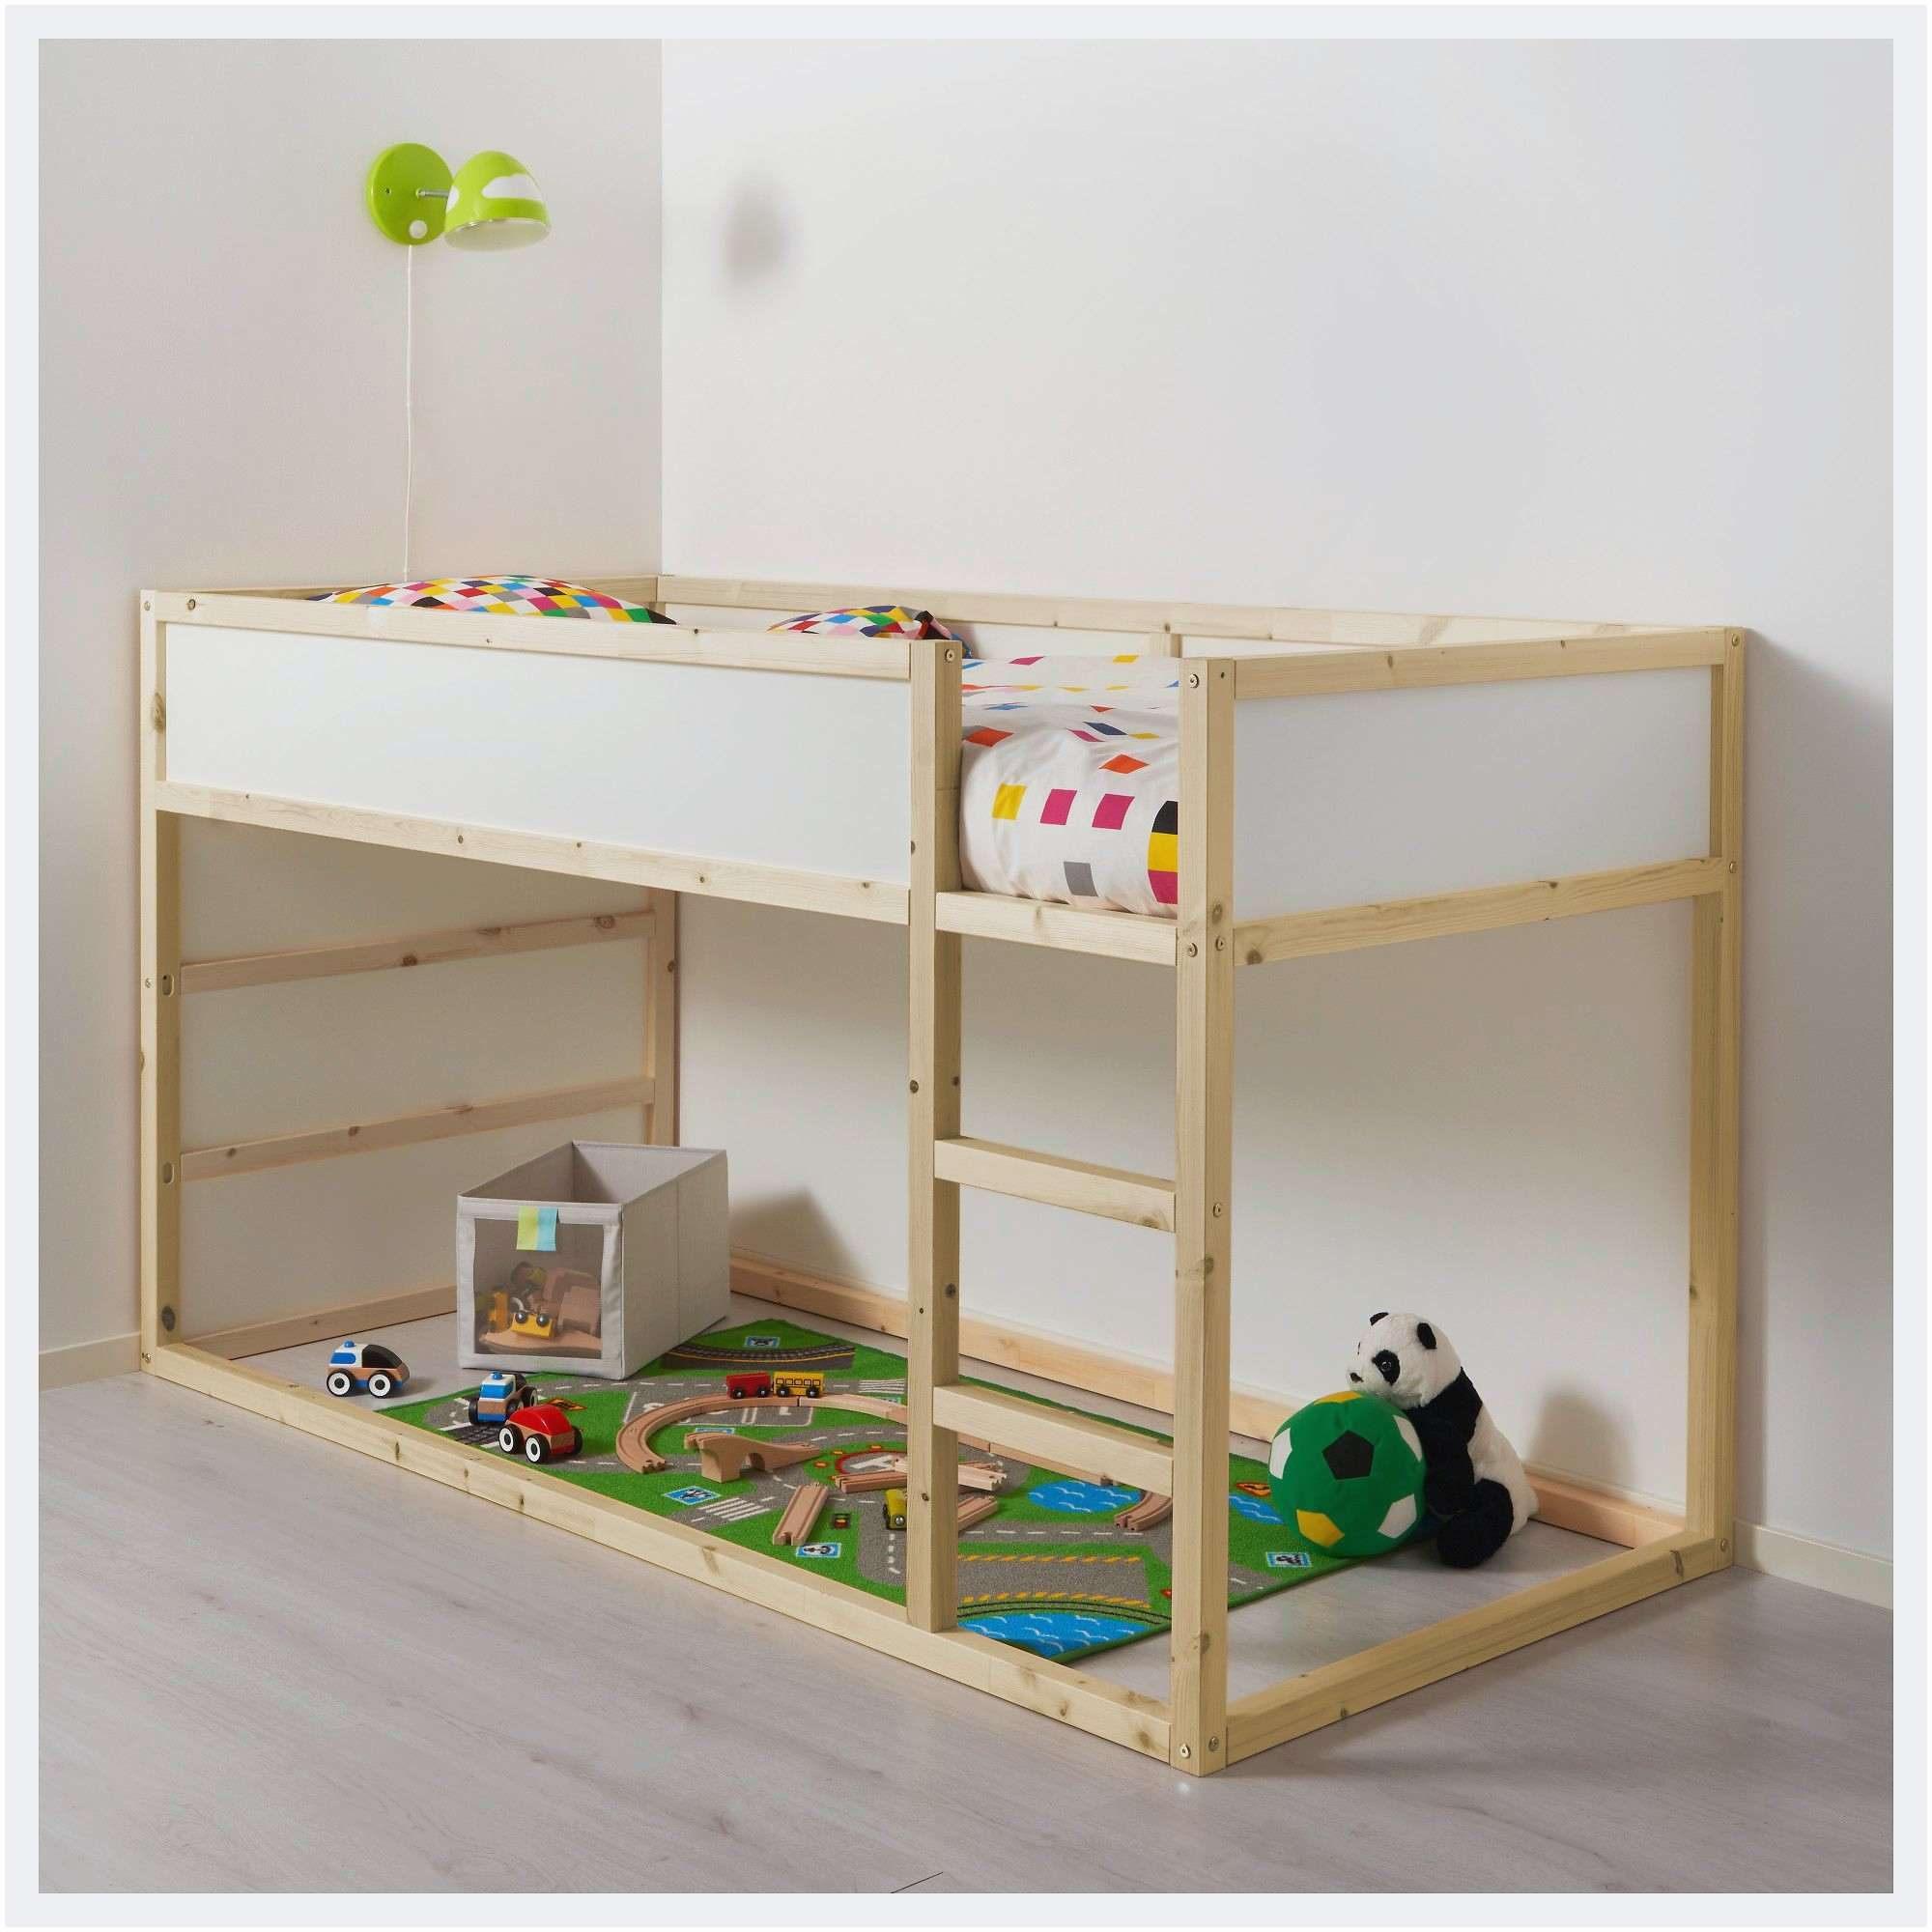 "Ikea Lit Cabane Frais Inspiré Kura ŽÅ¡ ŽµŽ²Ž¬""Ž¹ Ž´Ž¹€Ž Ž ' Å'Ë†Ž·' Ikea Toddler S"